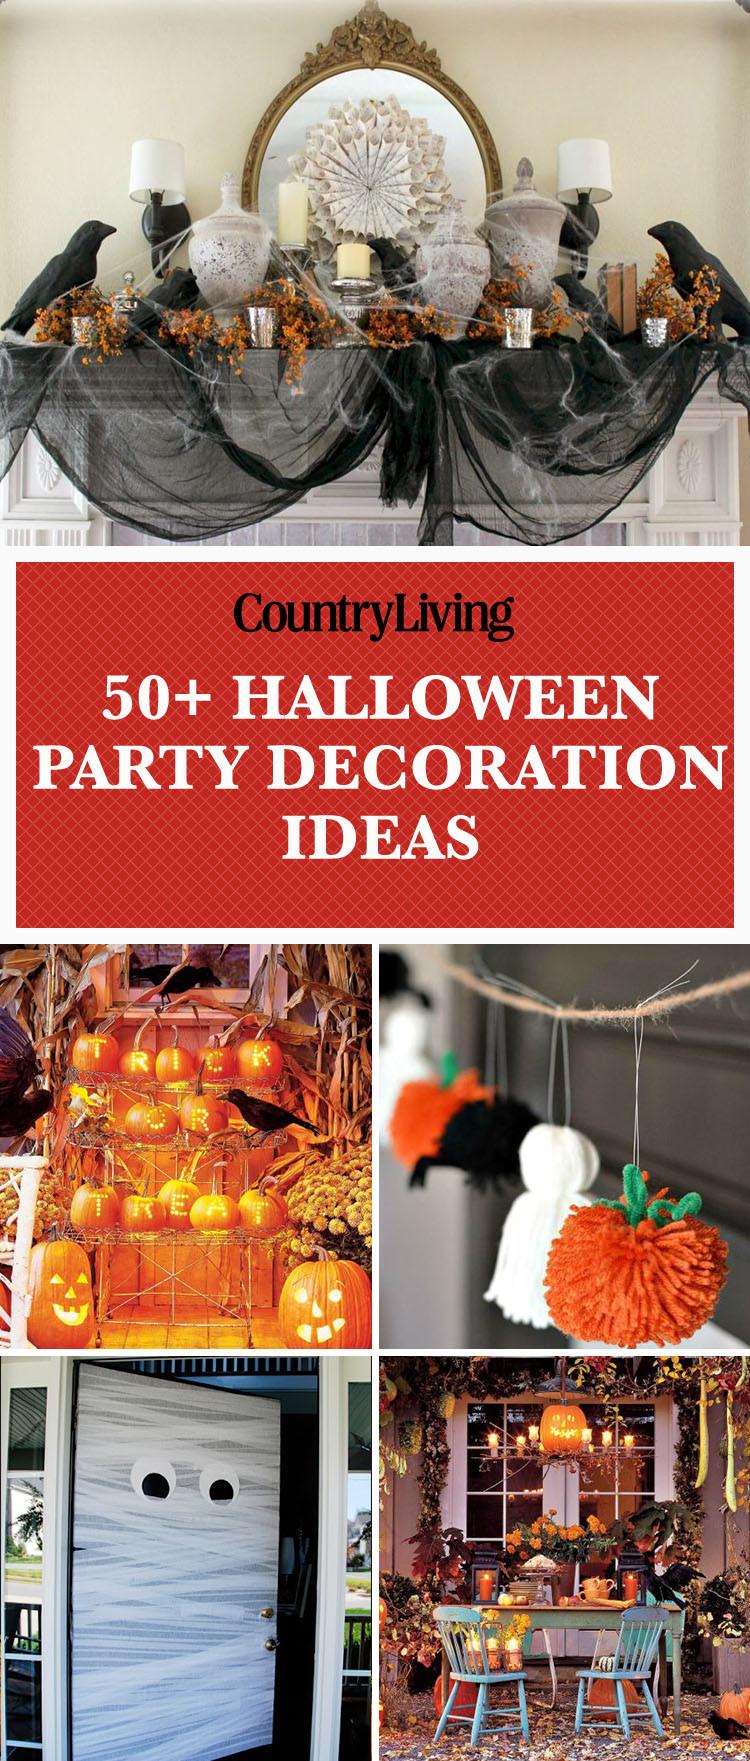 Halloween Decorating Party Ideas  56 Fun Halloween Party Decorating Ideas Spooky Halloween